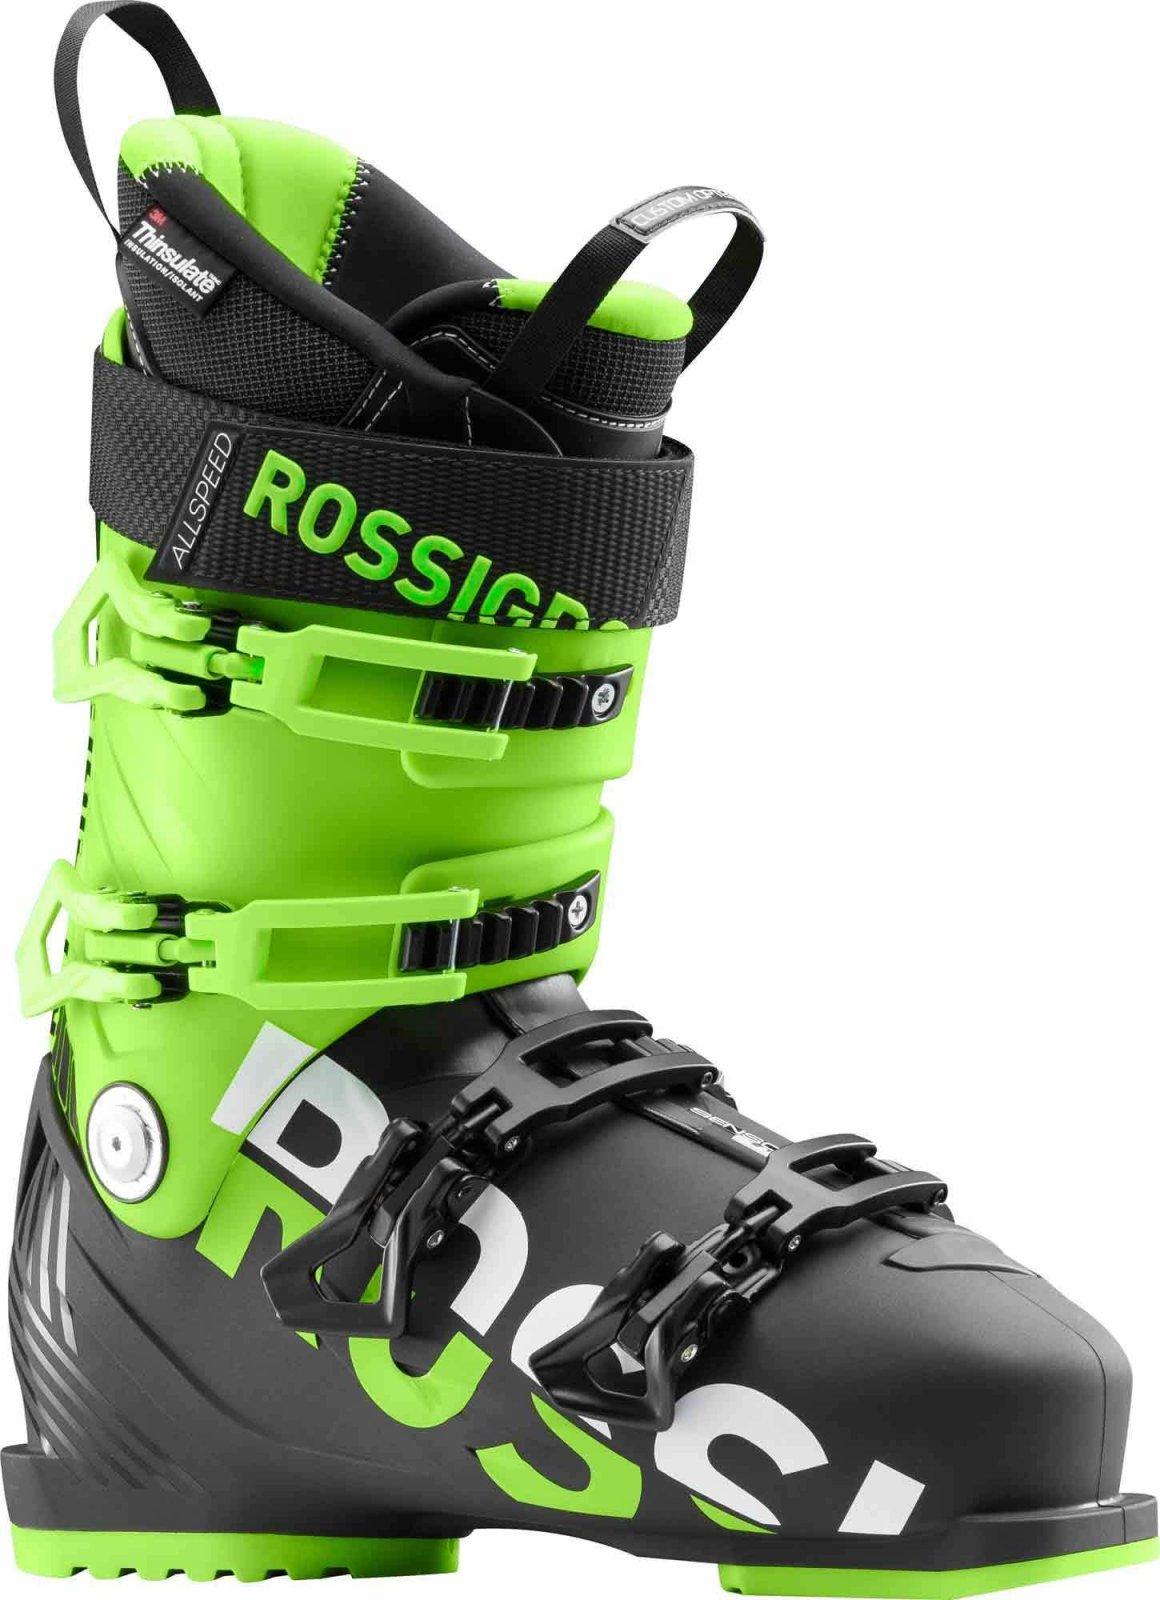 Rossignol Allspeed 100 Ski Boots 2018